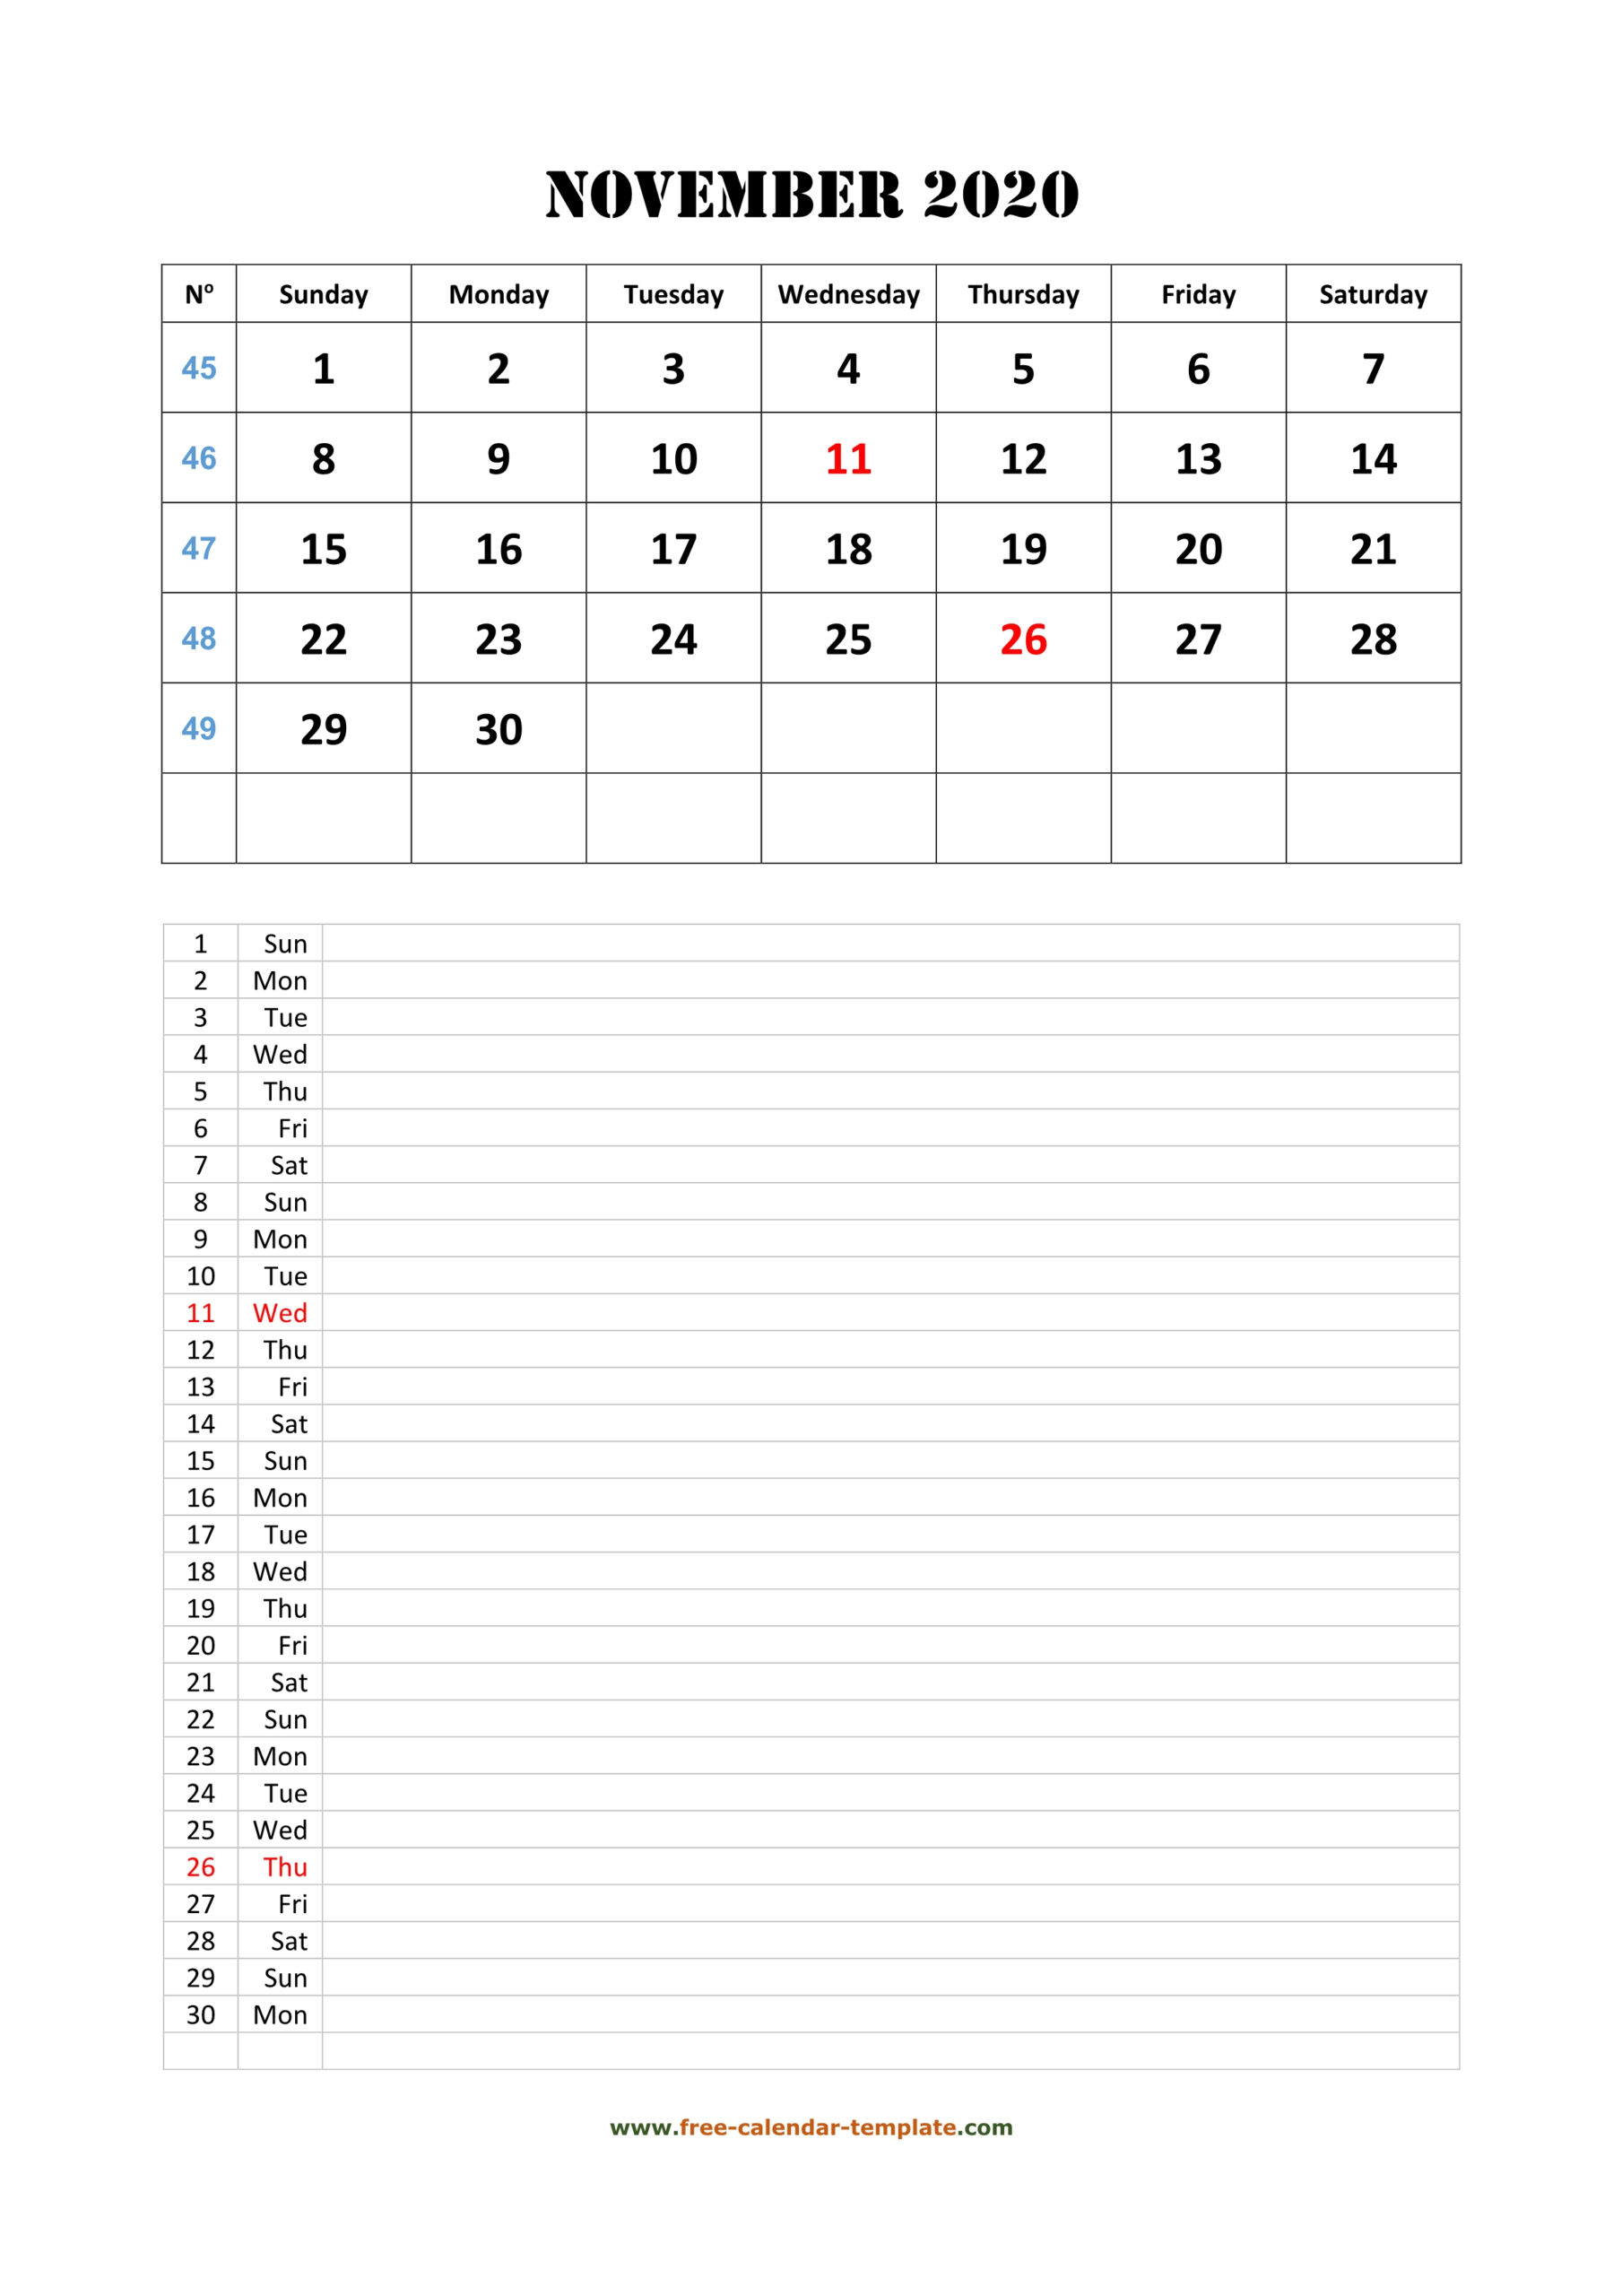 November 2020 Free Calendar Tempplate | Free-Calendar